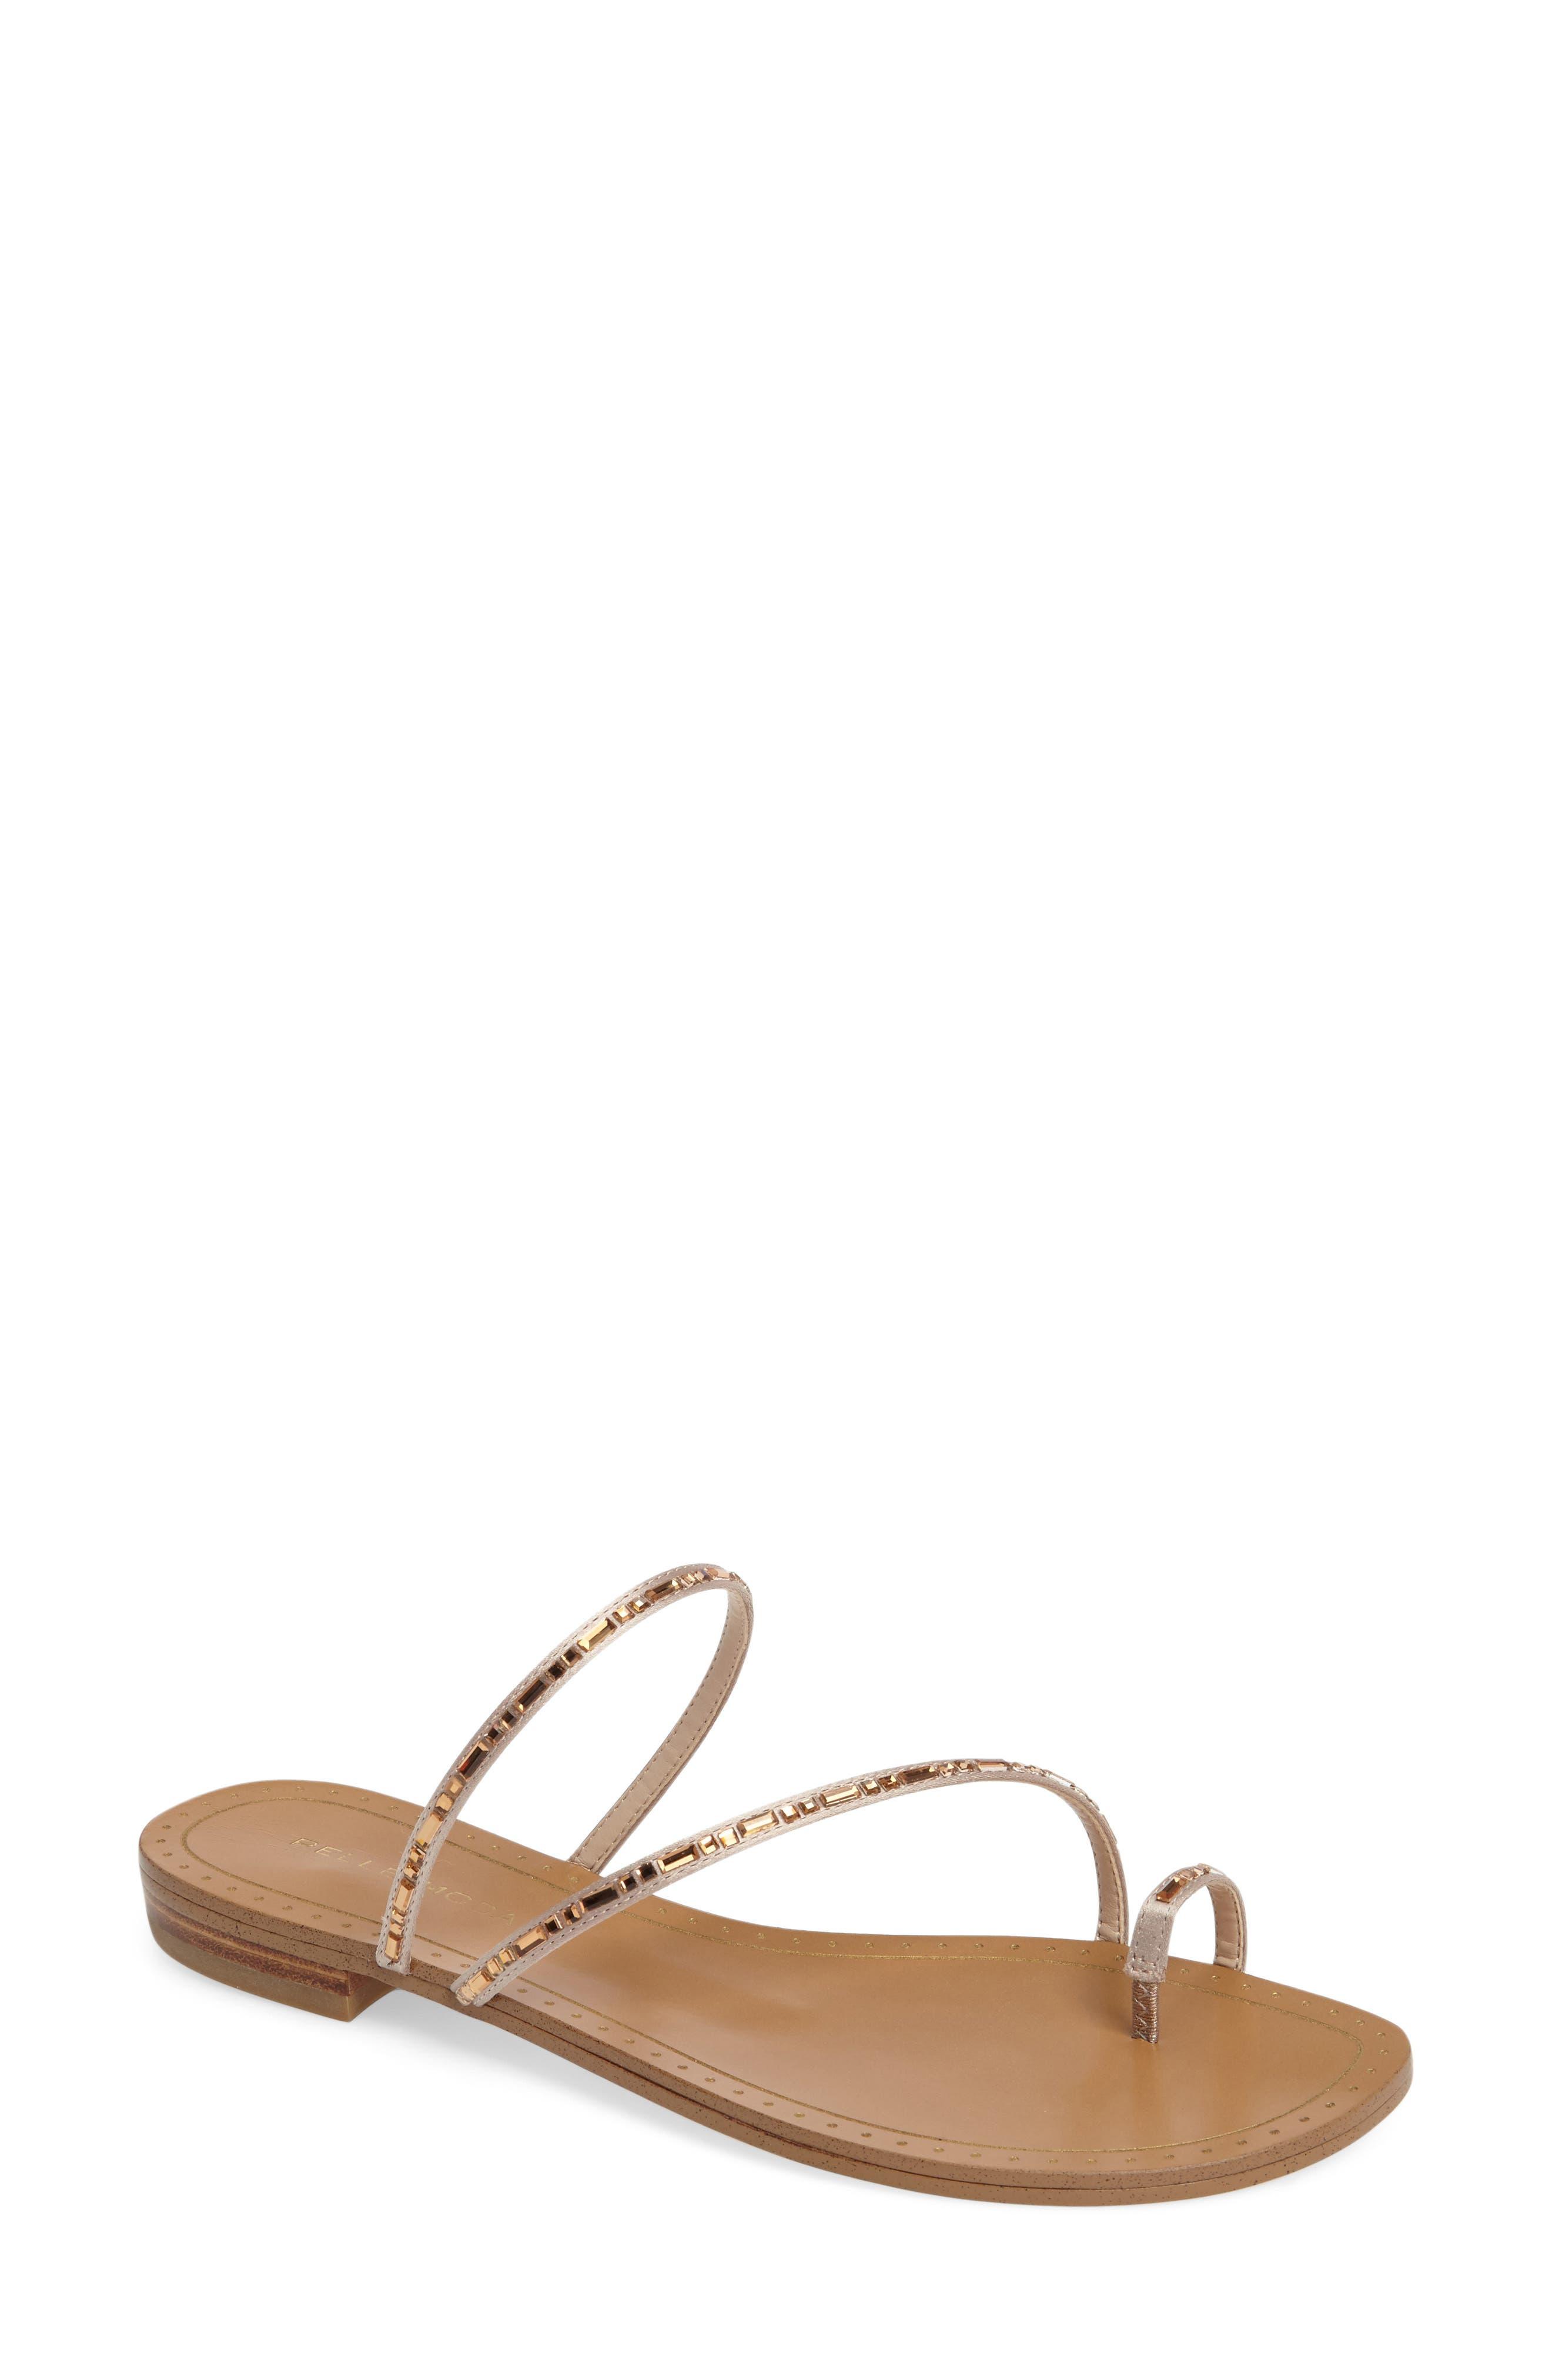 Pelle Moda Bohem Embellished Sandal (Women)